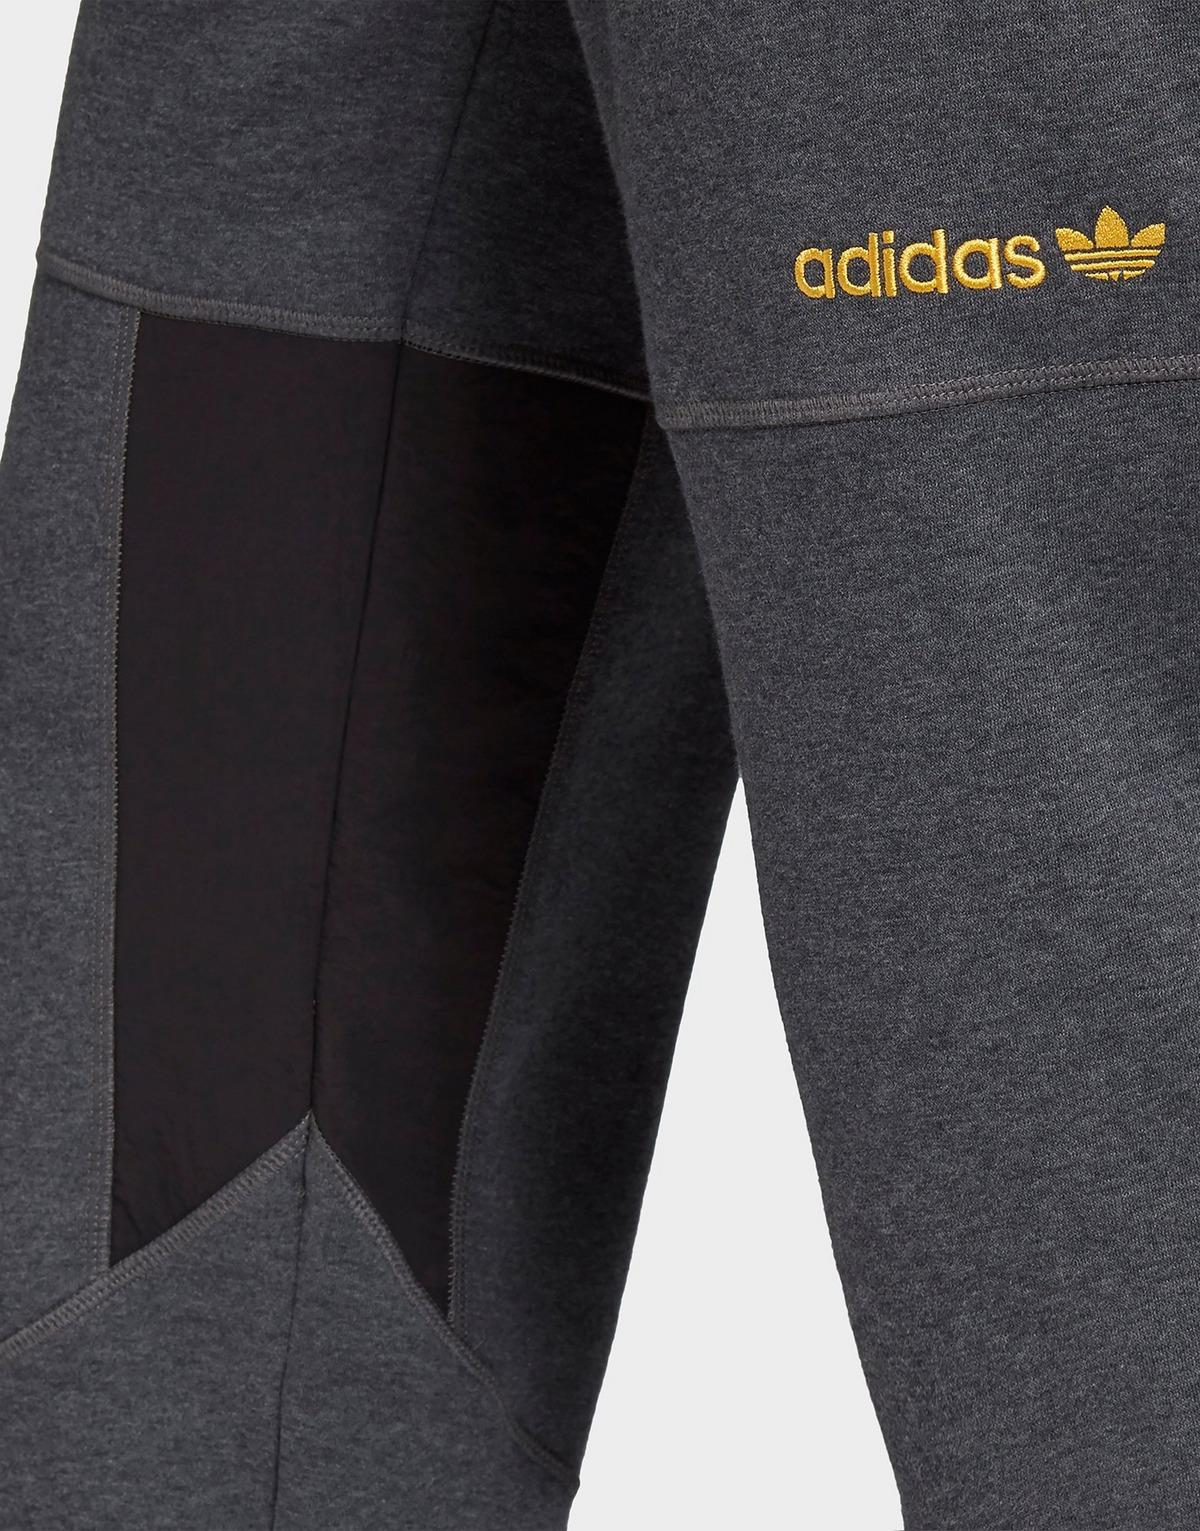 Adidas Originals Adventure Field Joggers